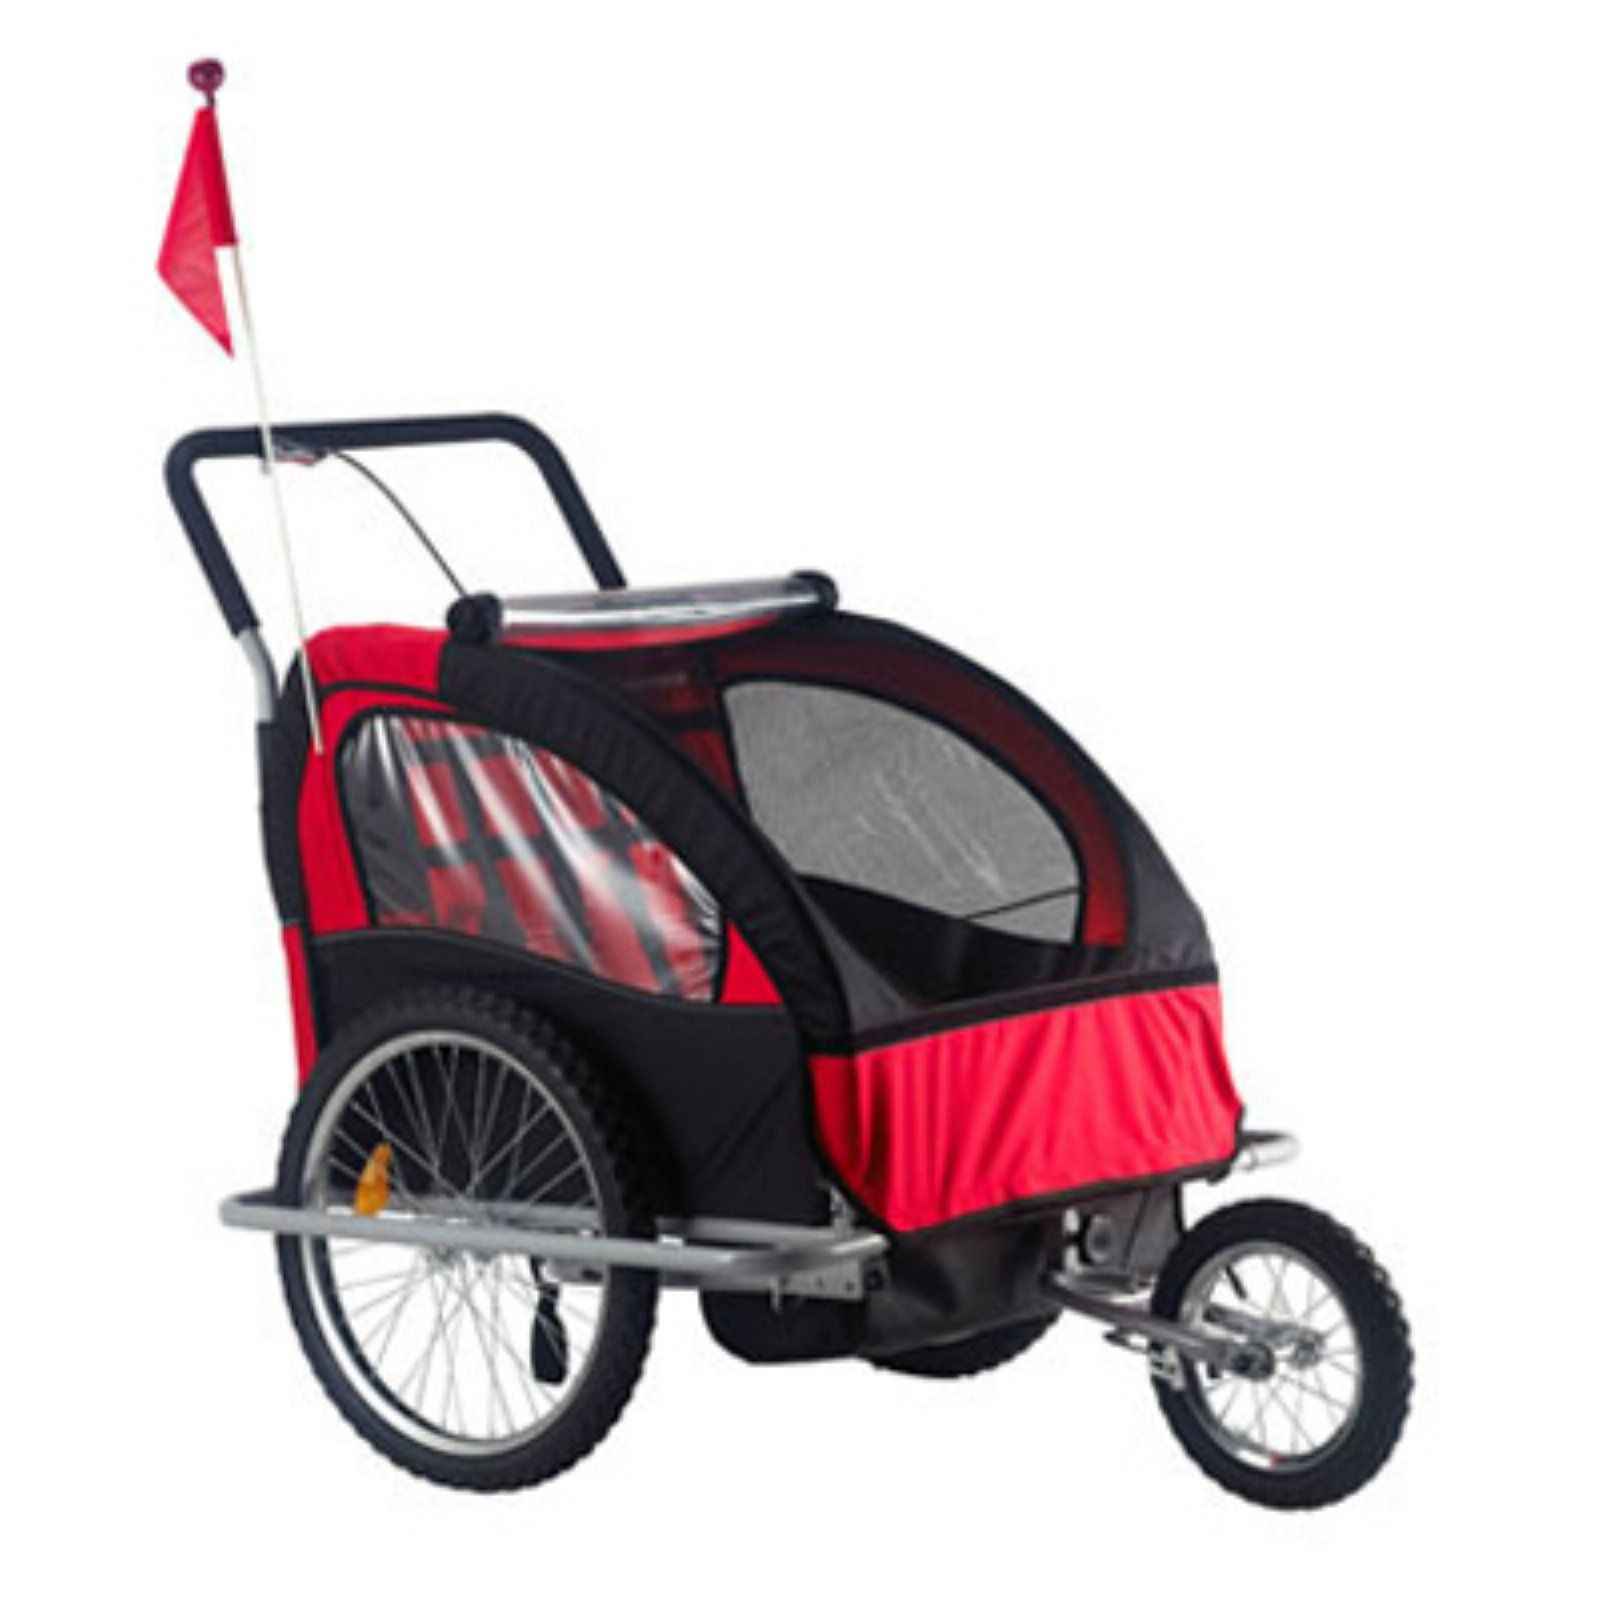 Aosom 2 in 1 Child Bike Trailer and Stroller Red Child